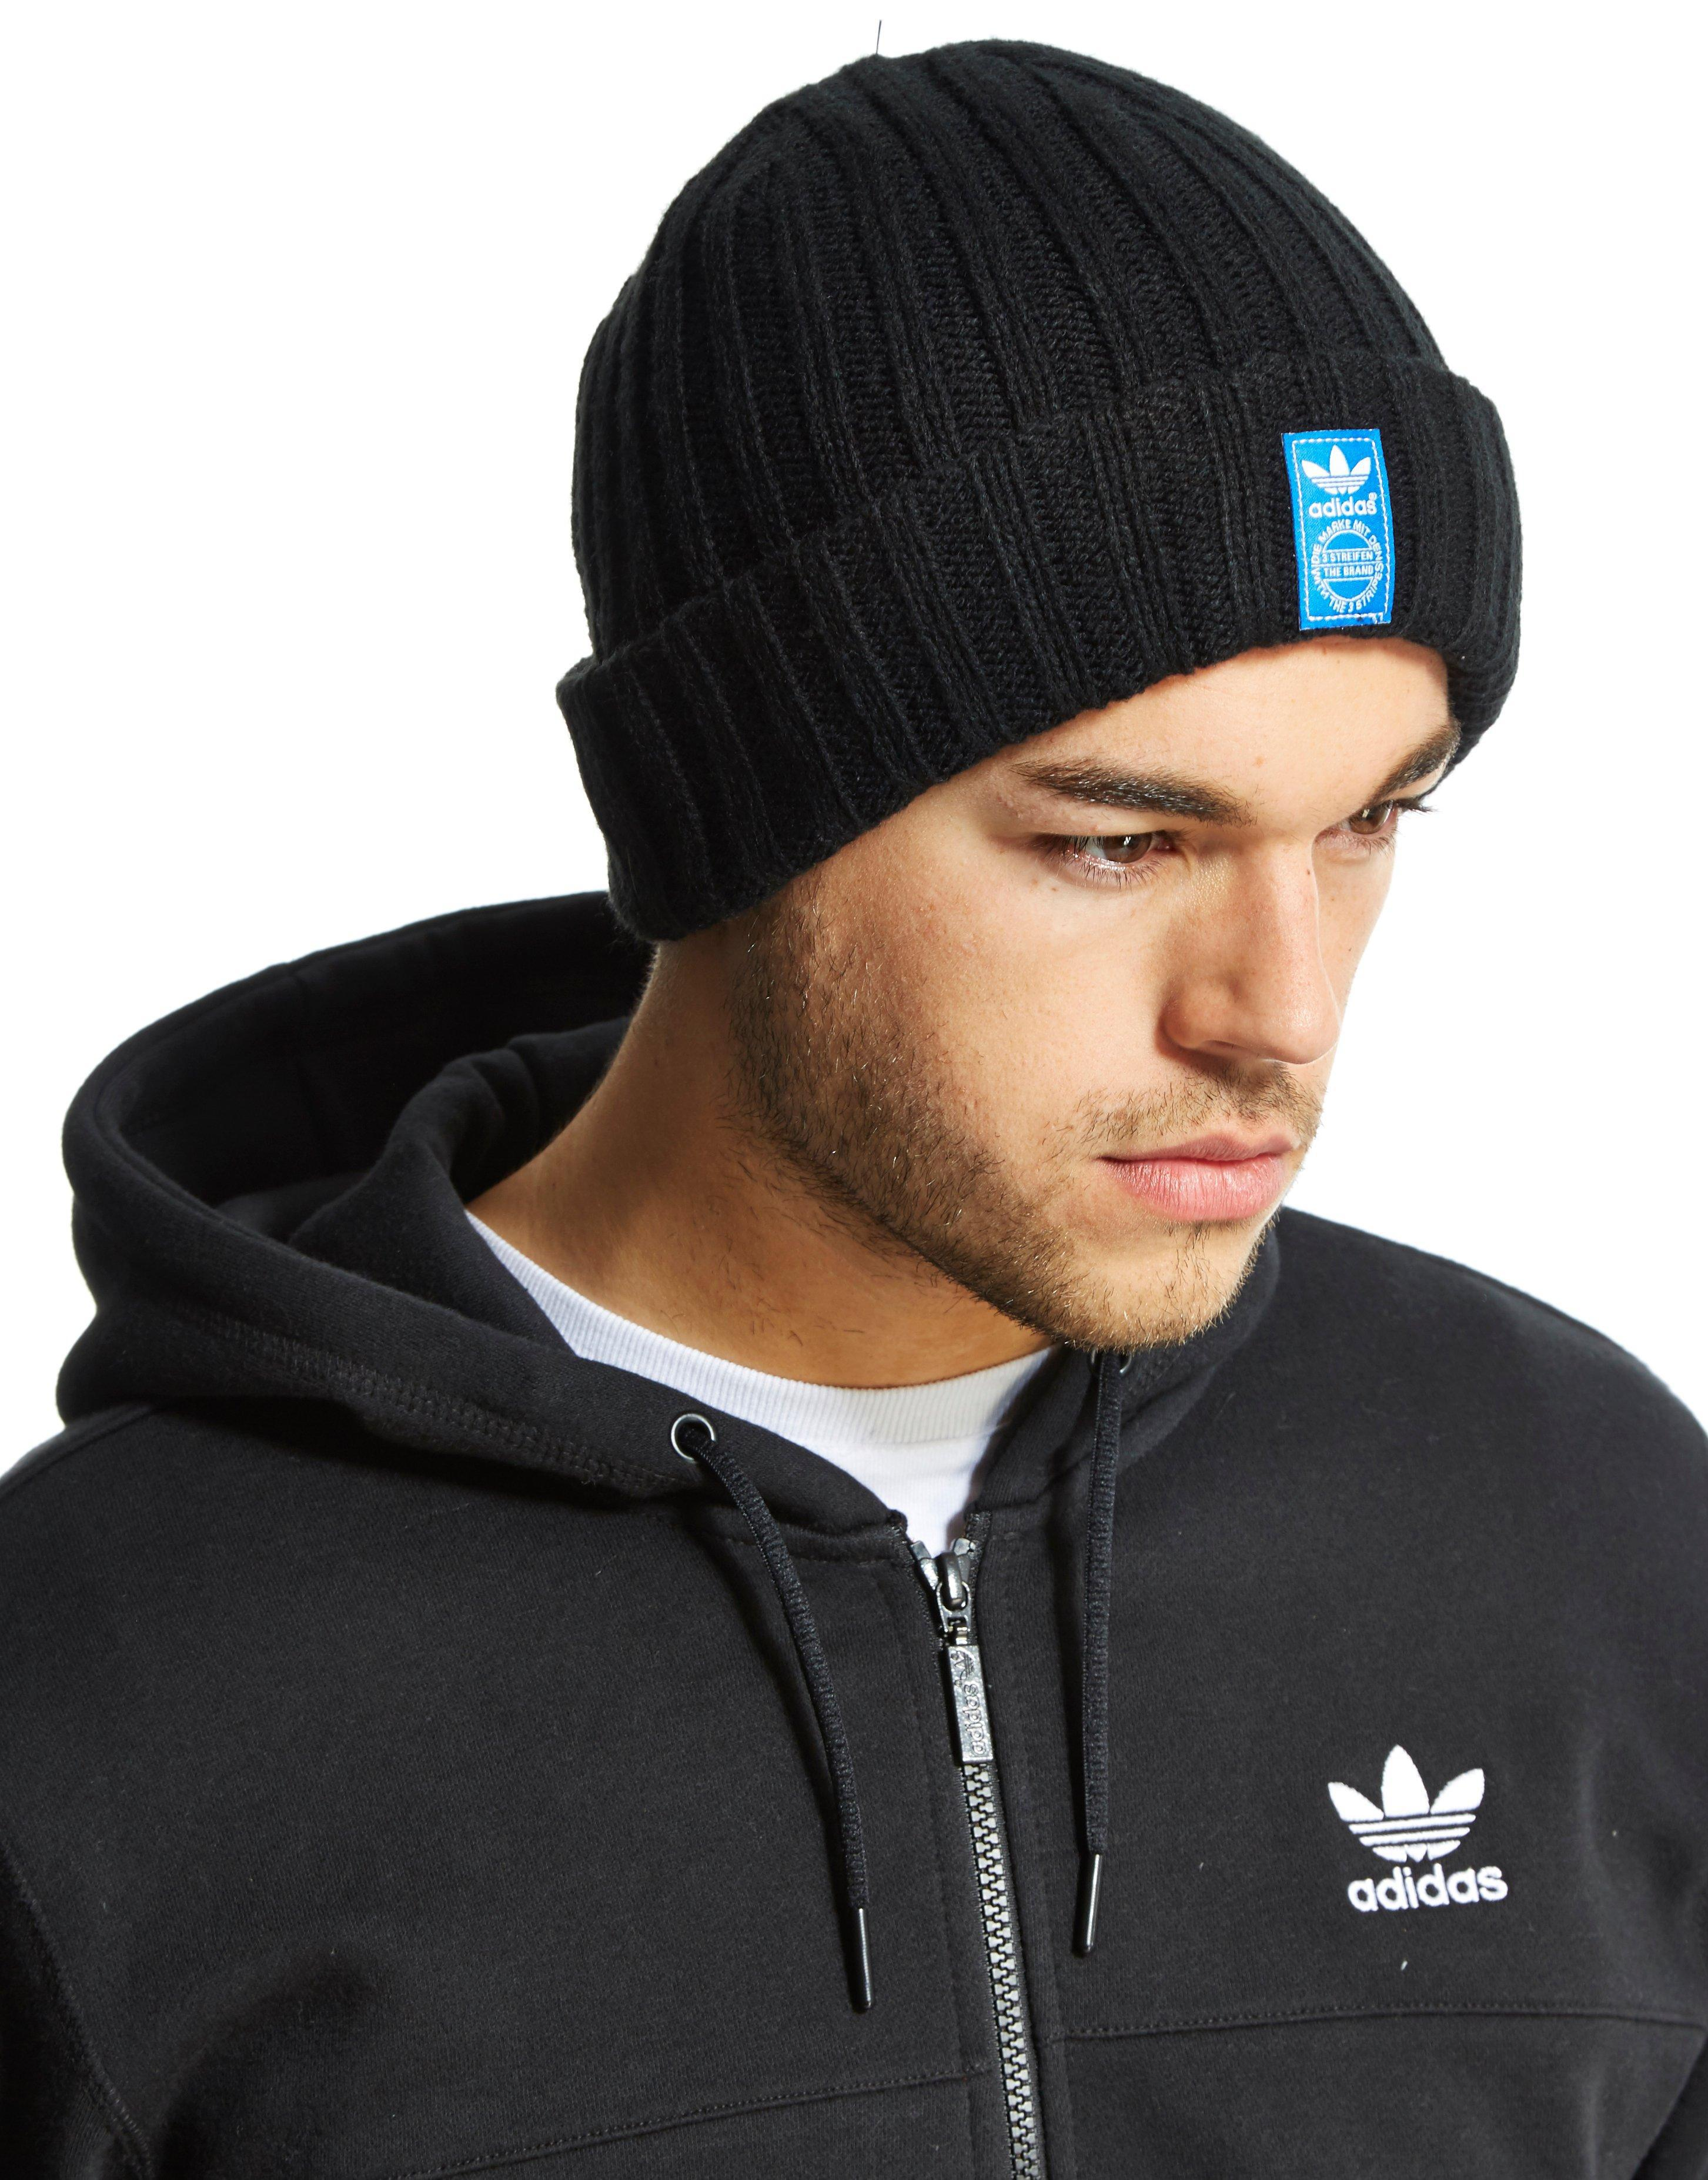 456f43d8257 Lyst - adidas Originals Fisherman Beanie in Black for Men